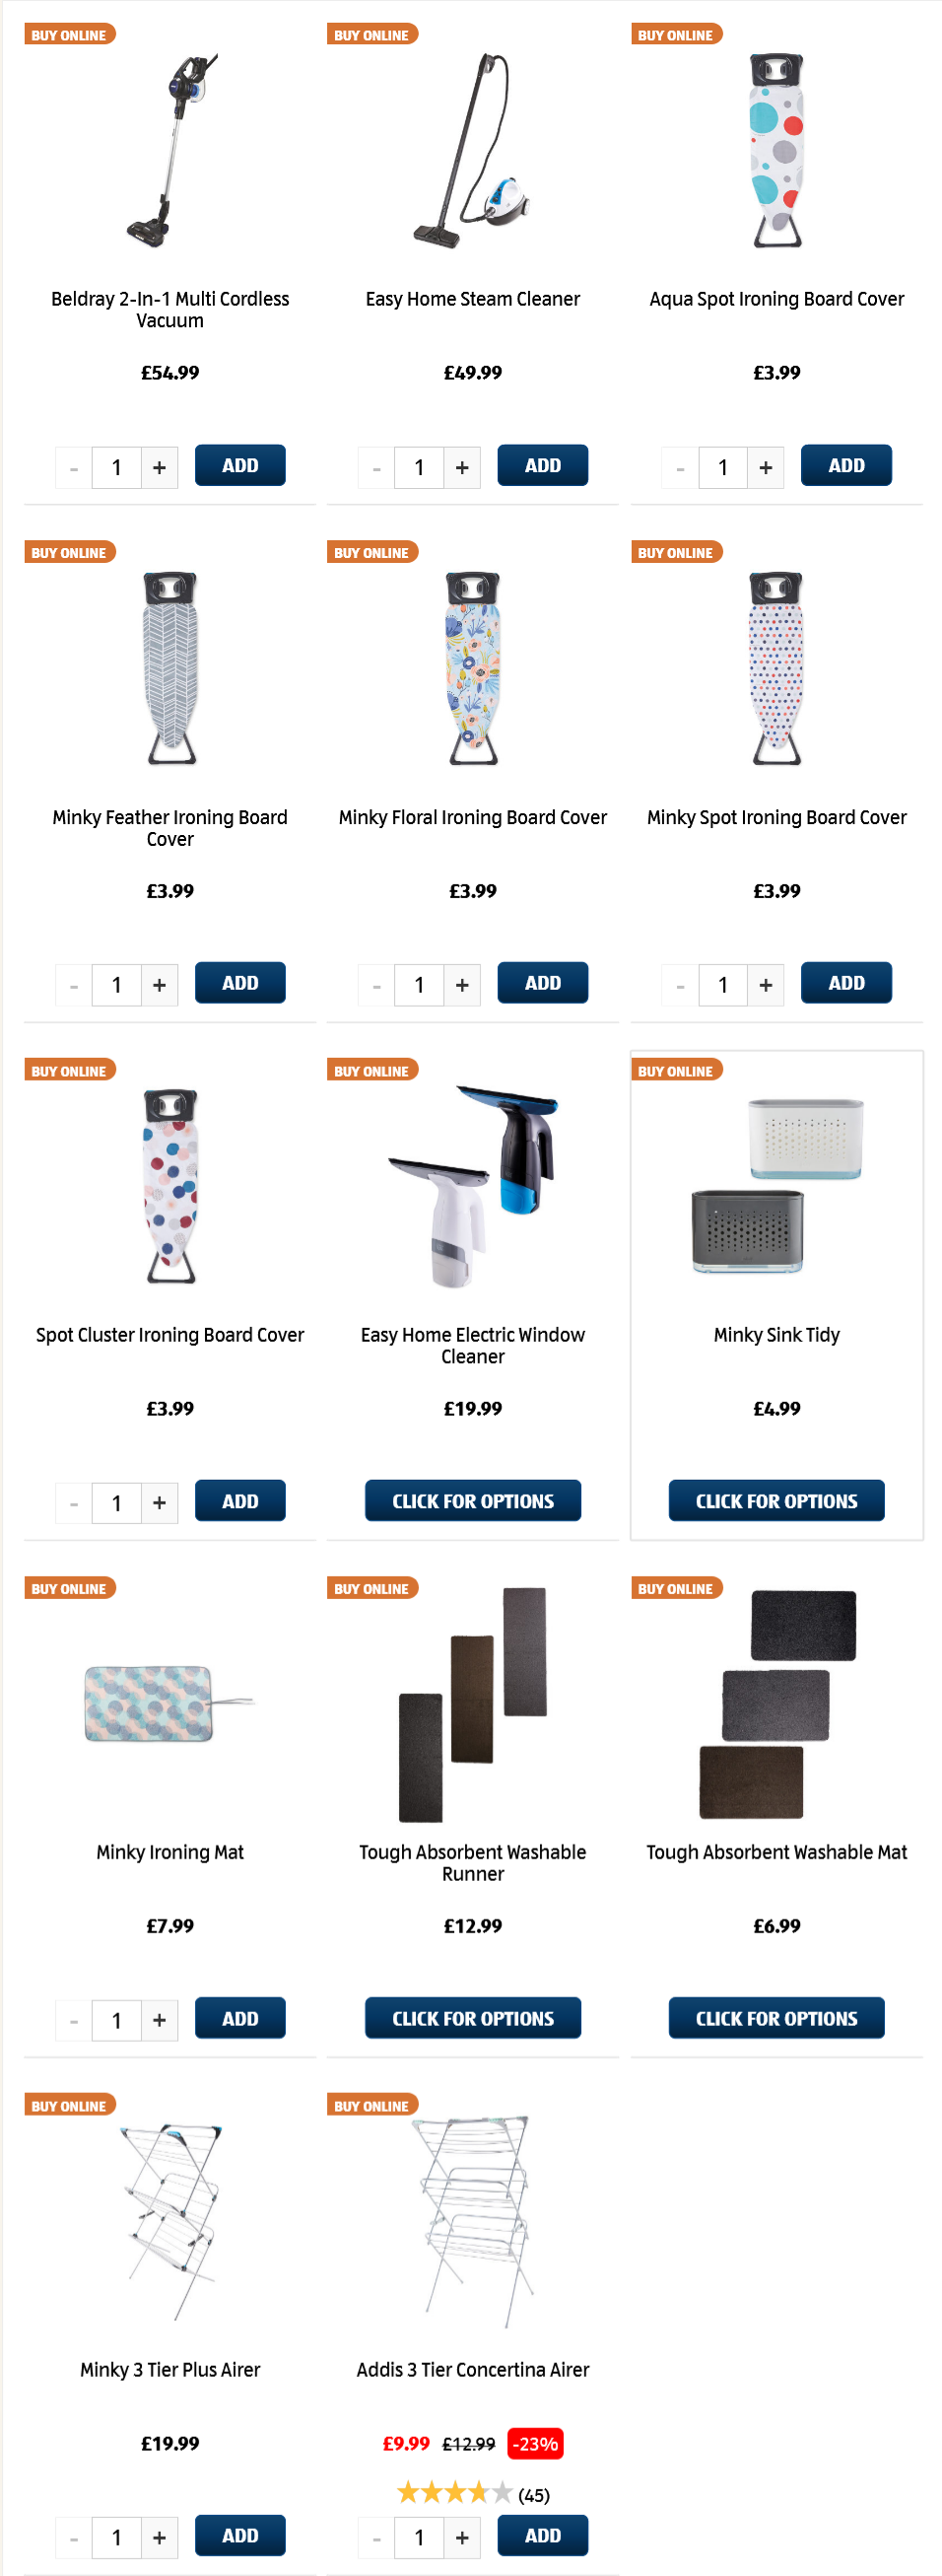 ALDI Laundry & Cleaning 14th March 2021 ALDI Sunday Offers